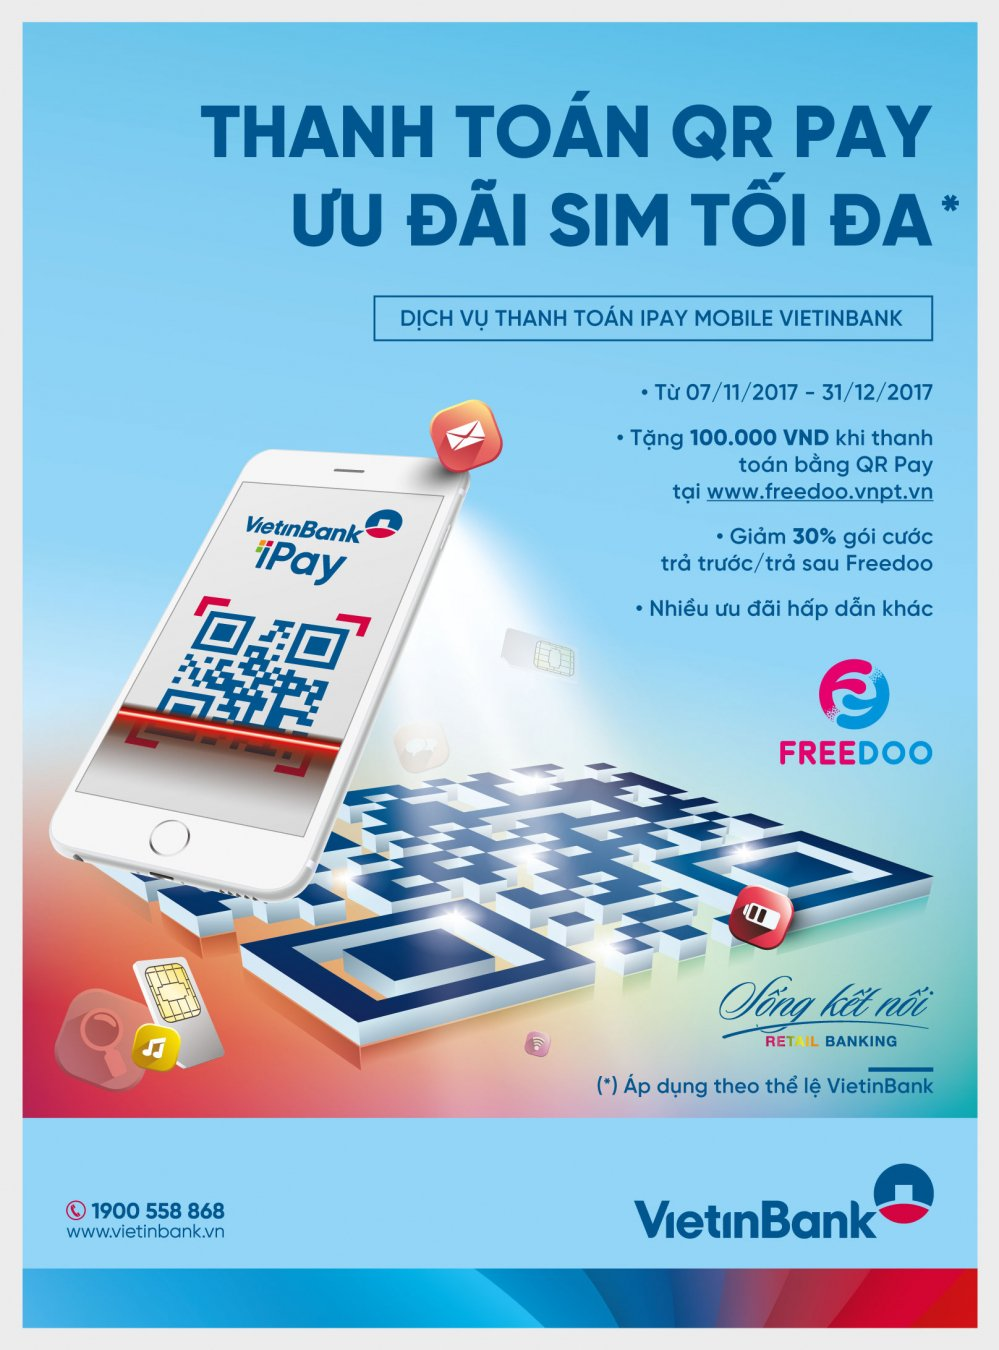 Thanh toan QR Pay nhan sim VinaPhone voi nhieu uu dai hap dan cung VietinBank hinh anh 1